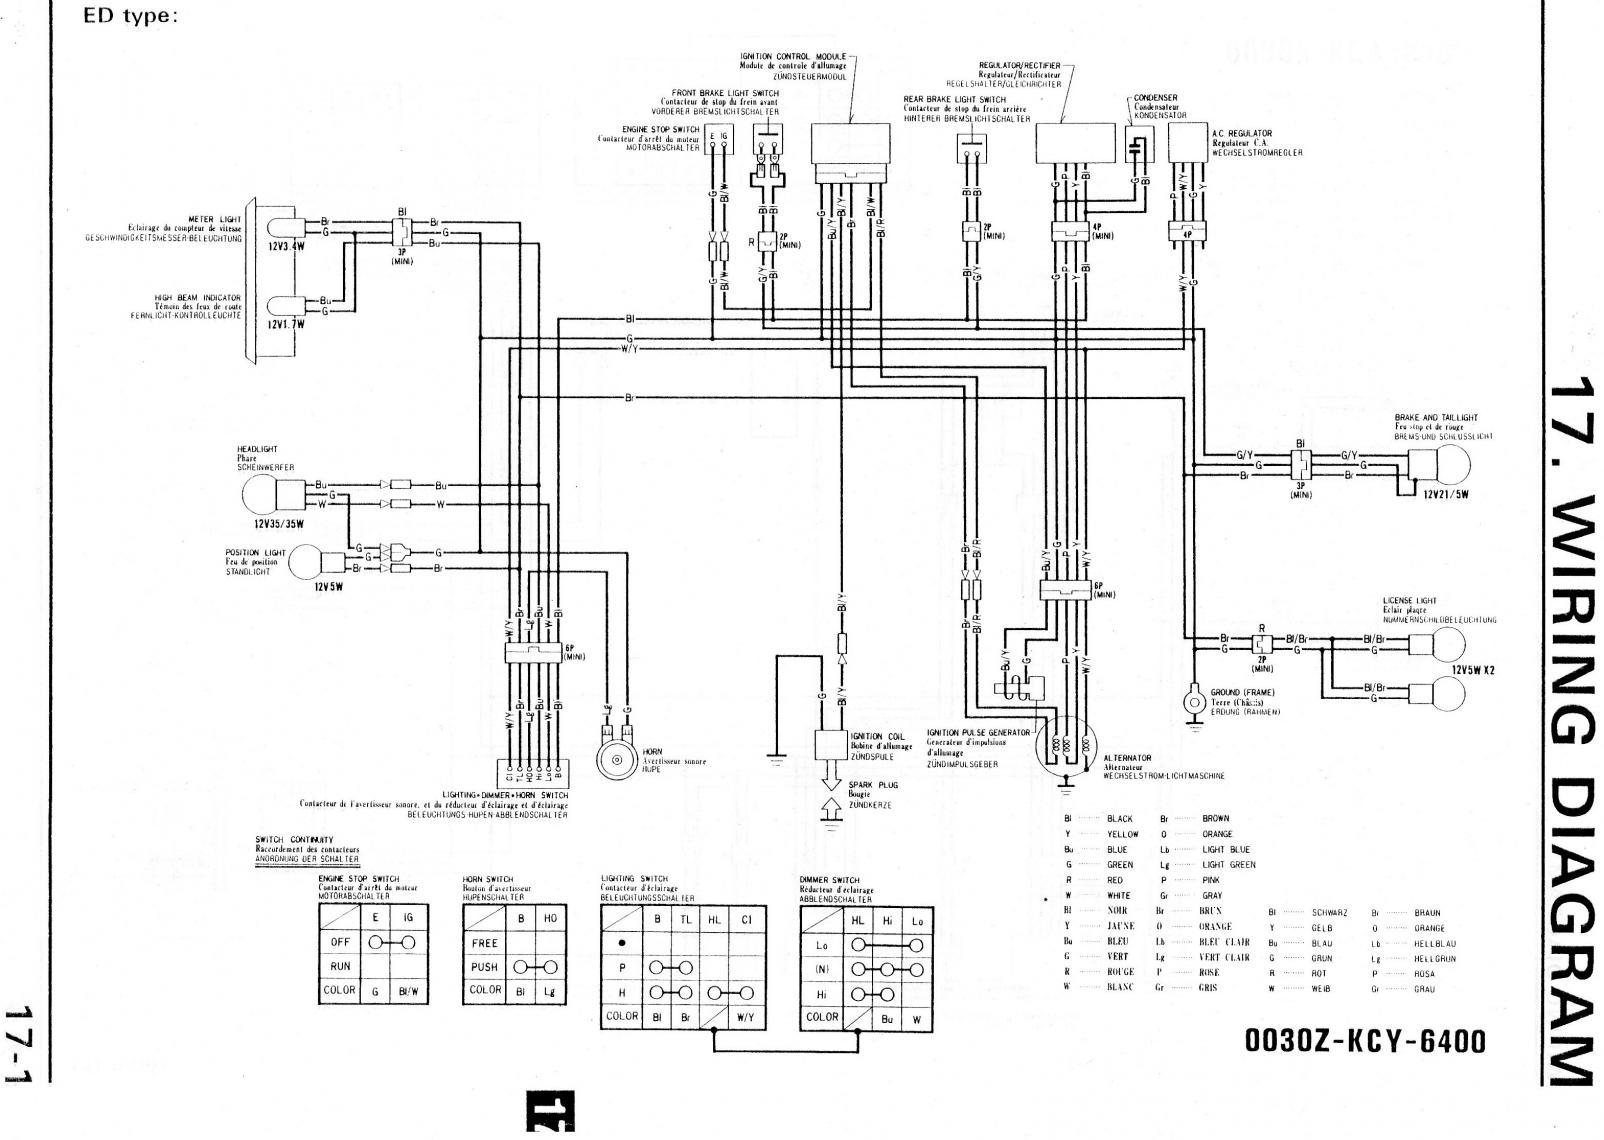 saturn lw 200 wiring diagram   rich-champion wiring diagram -  rich-champion.ilcasaledelbarone.it  ilcasaledelbarone.it